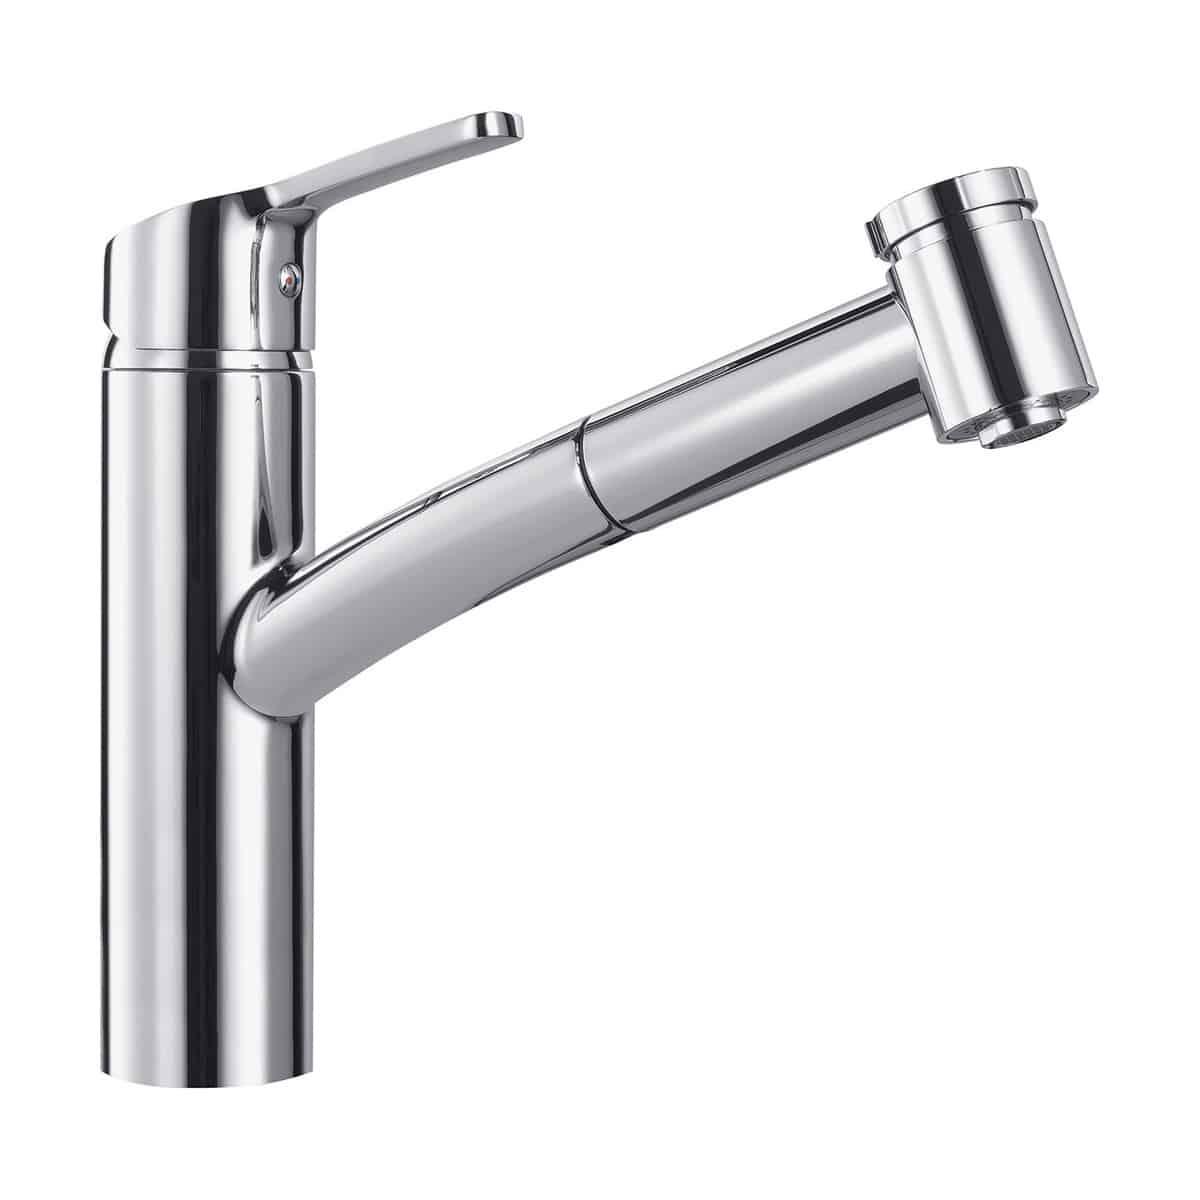 Franke smart douchette mitigeurs robinets direct evier for Franke robinet cuisine